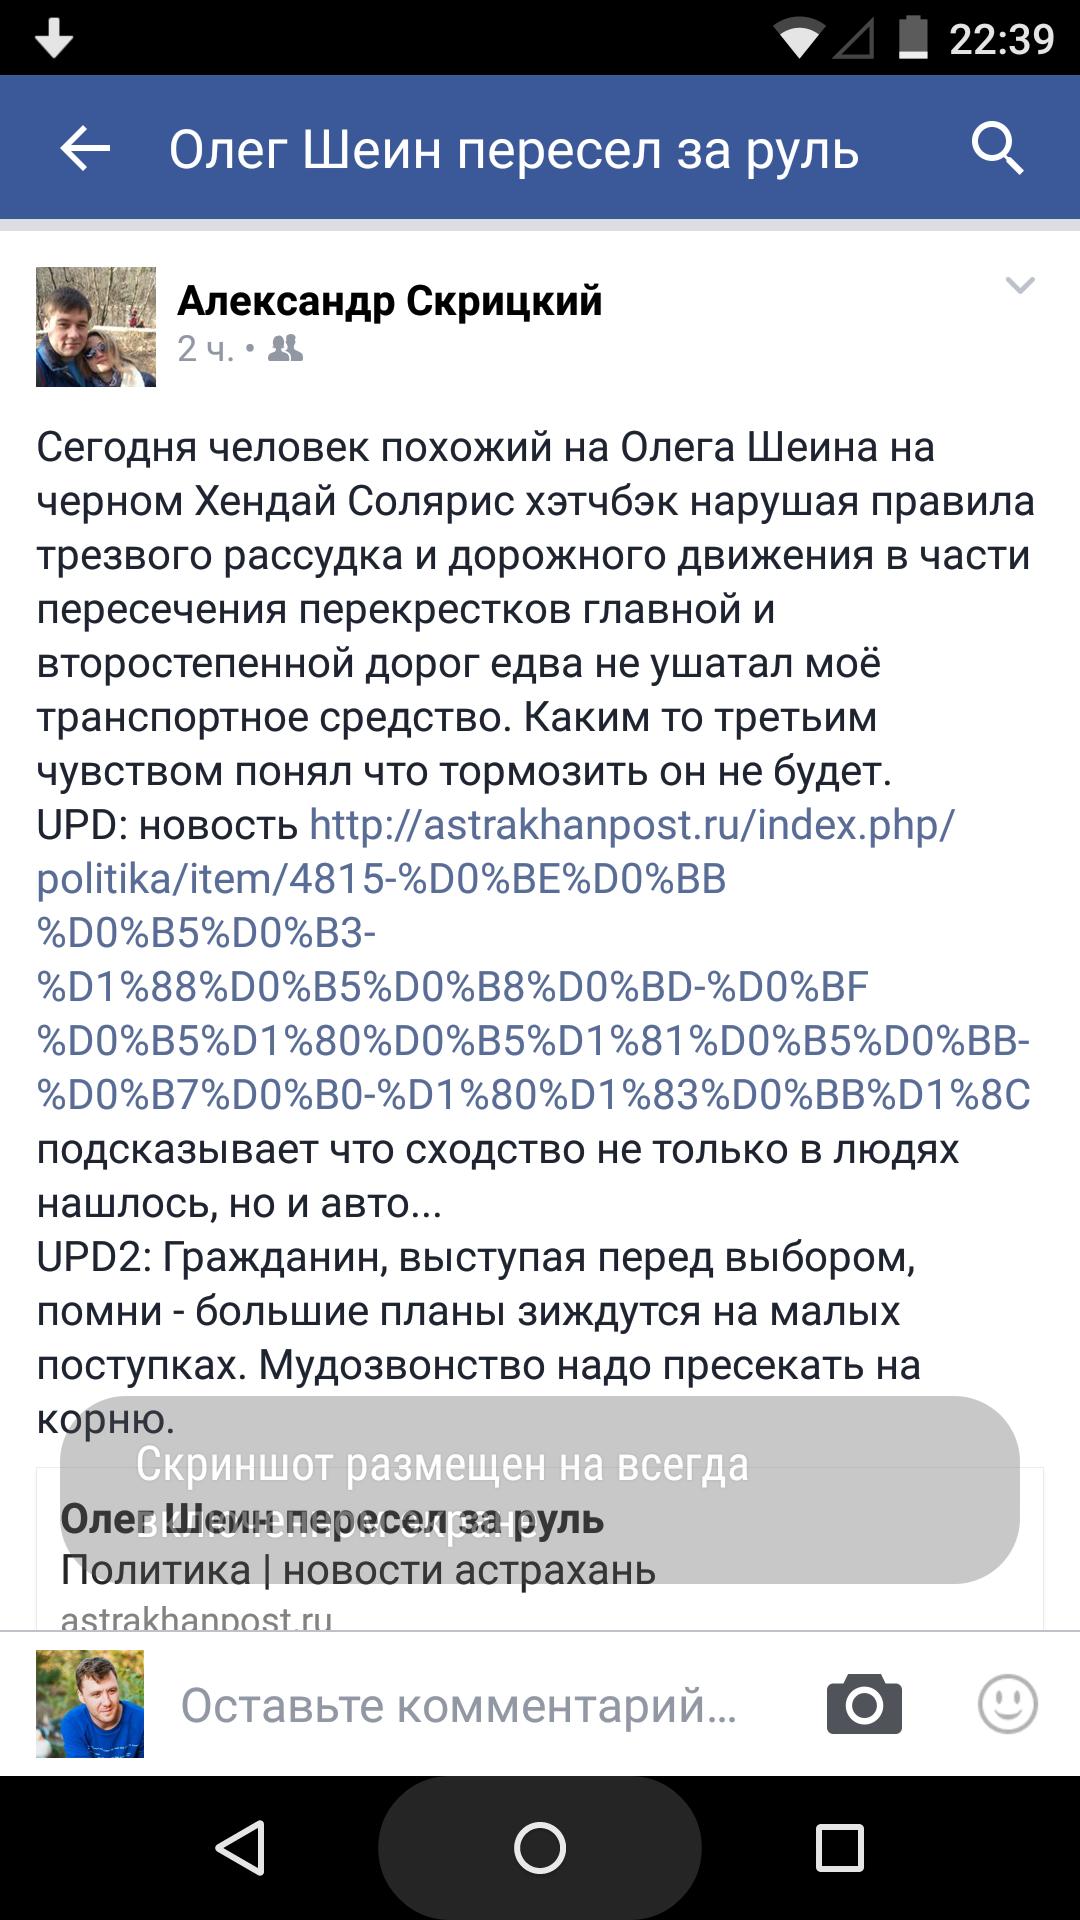 images UVD shein avto screenshot Астраханец пожаловался на Олега Шеина, не соблюдающего ПДД